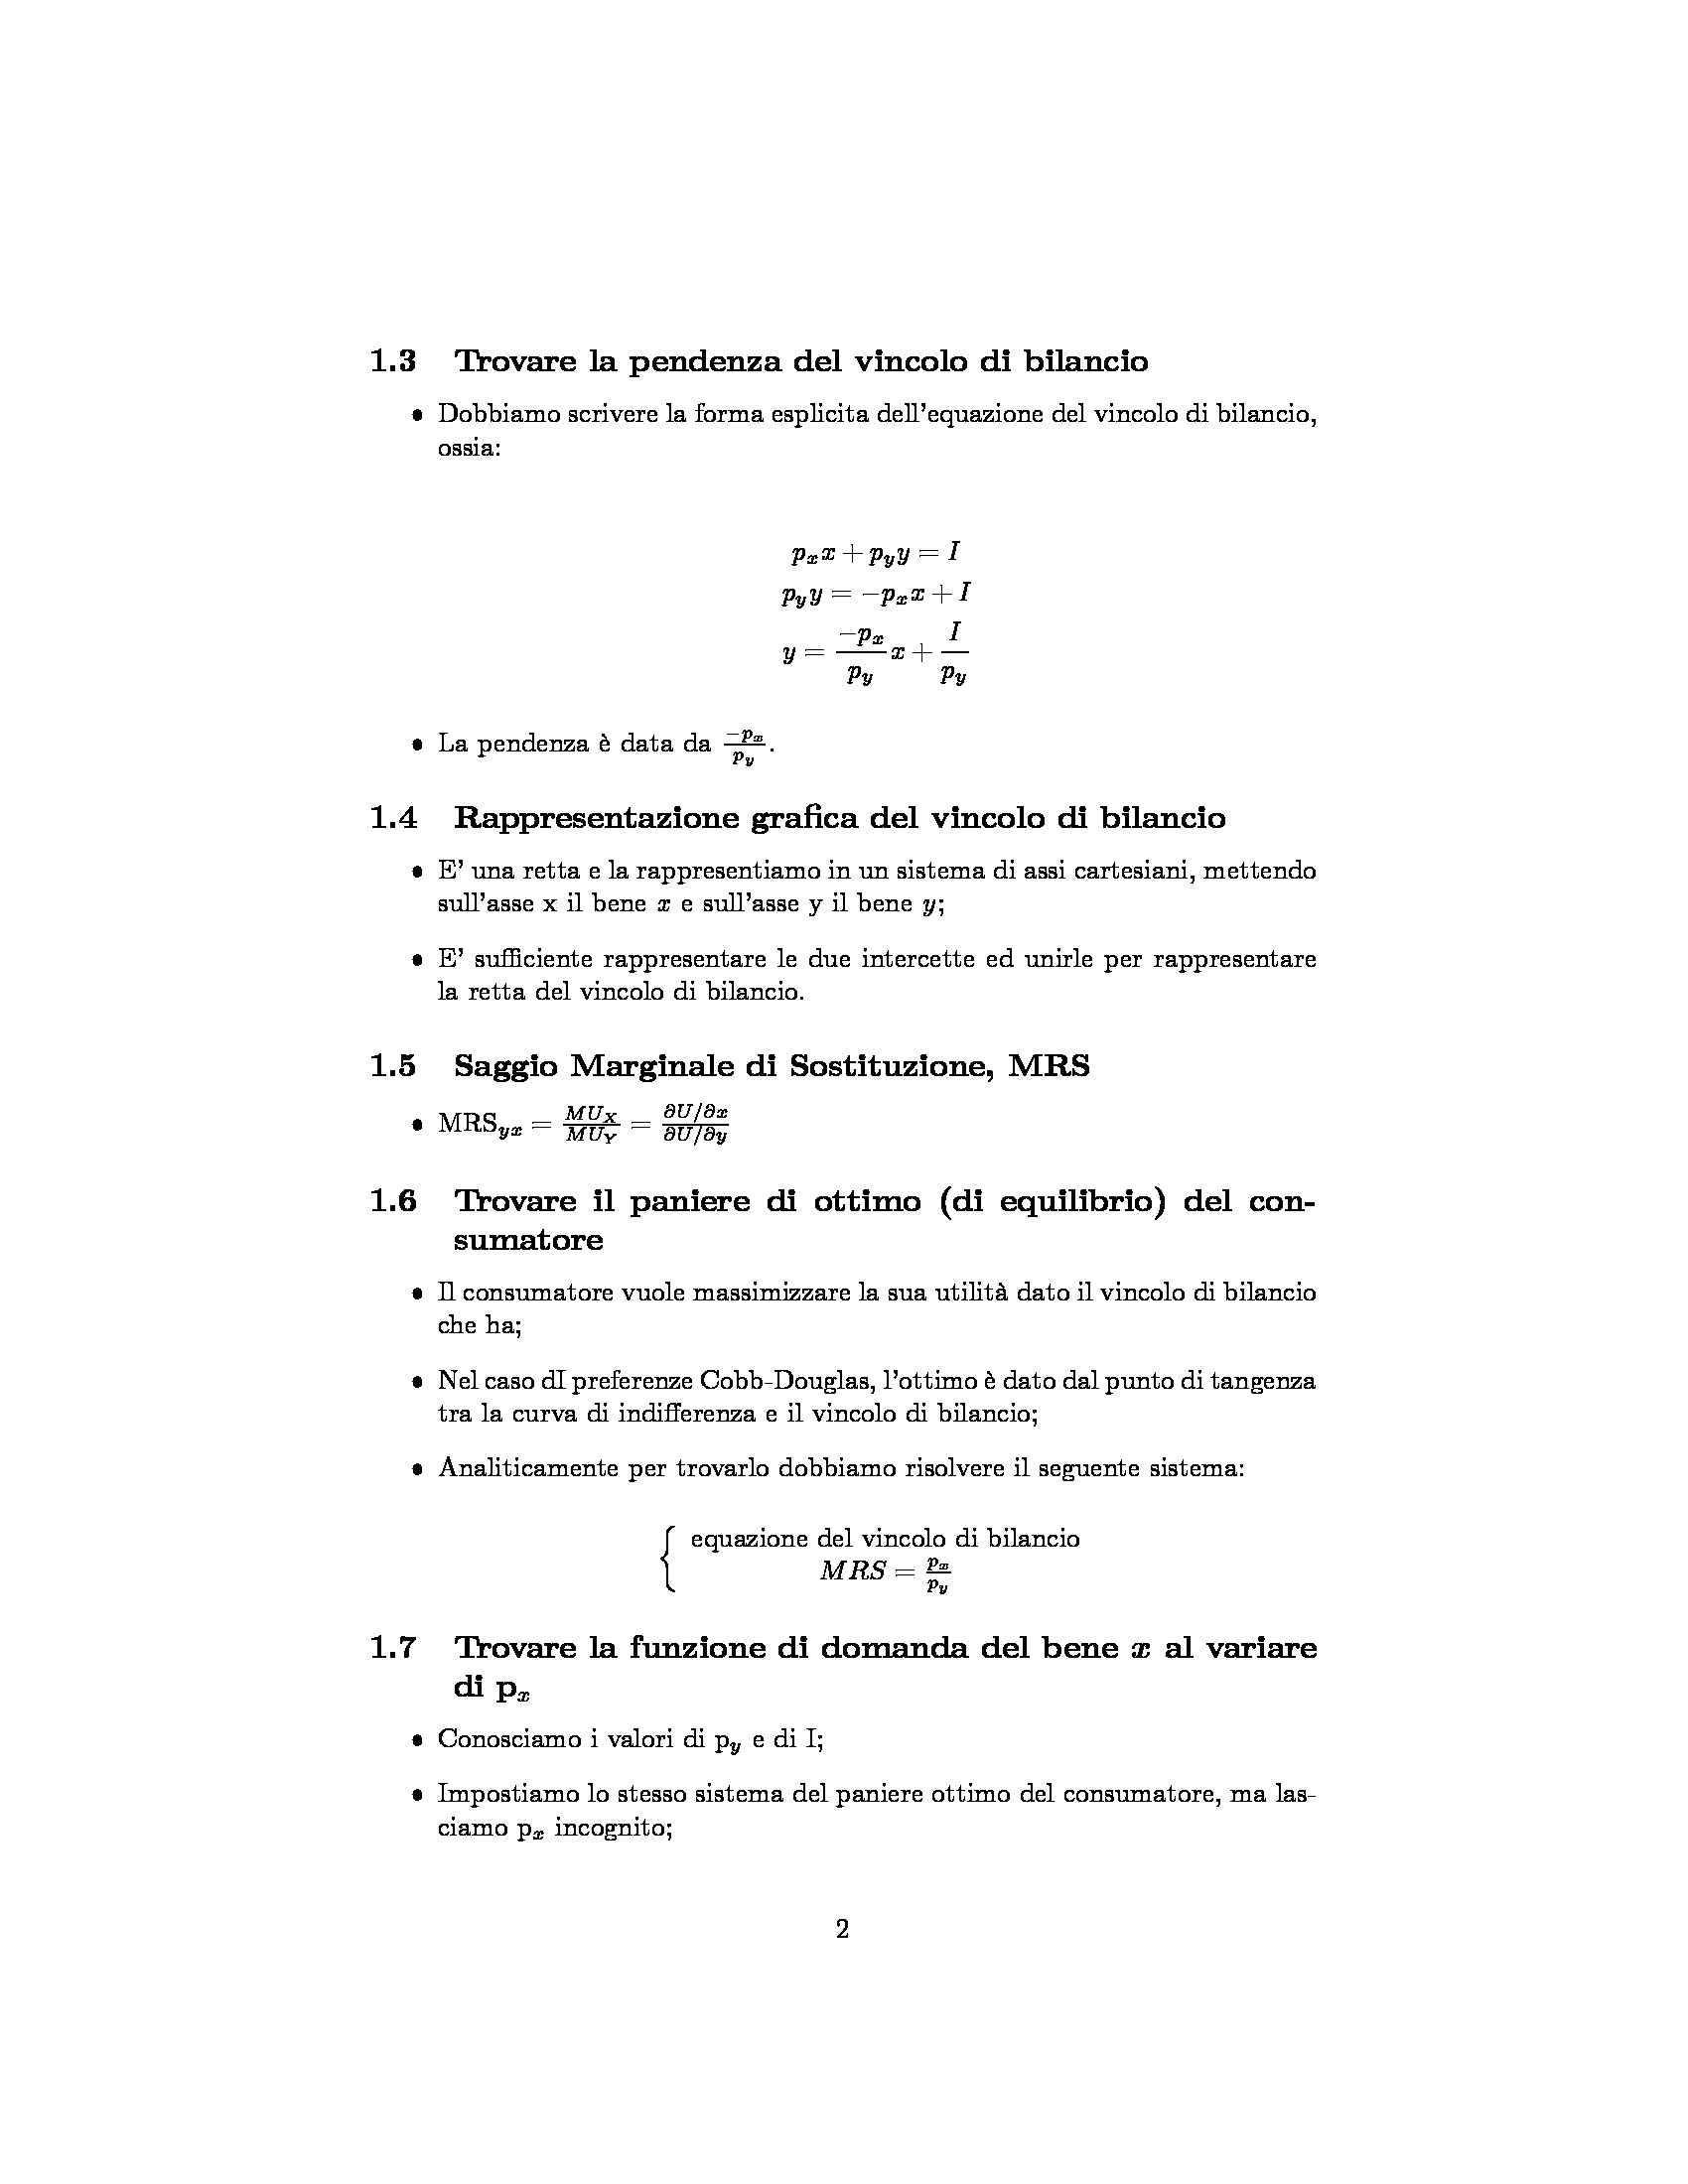 Microeconomia - Formulario Pag. 2